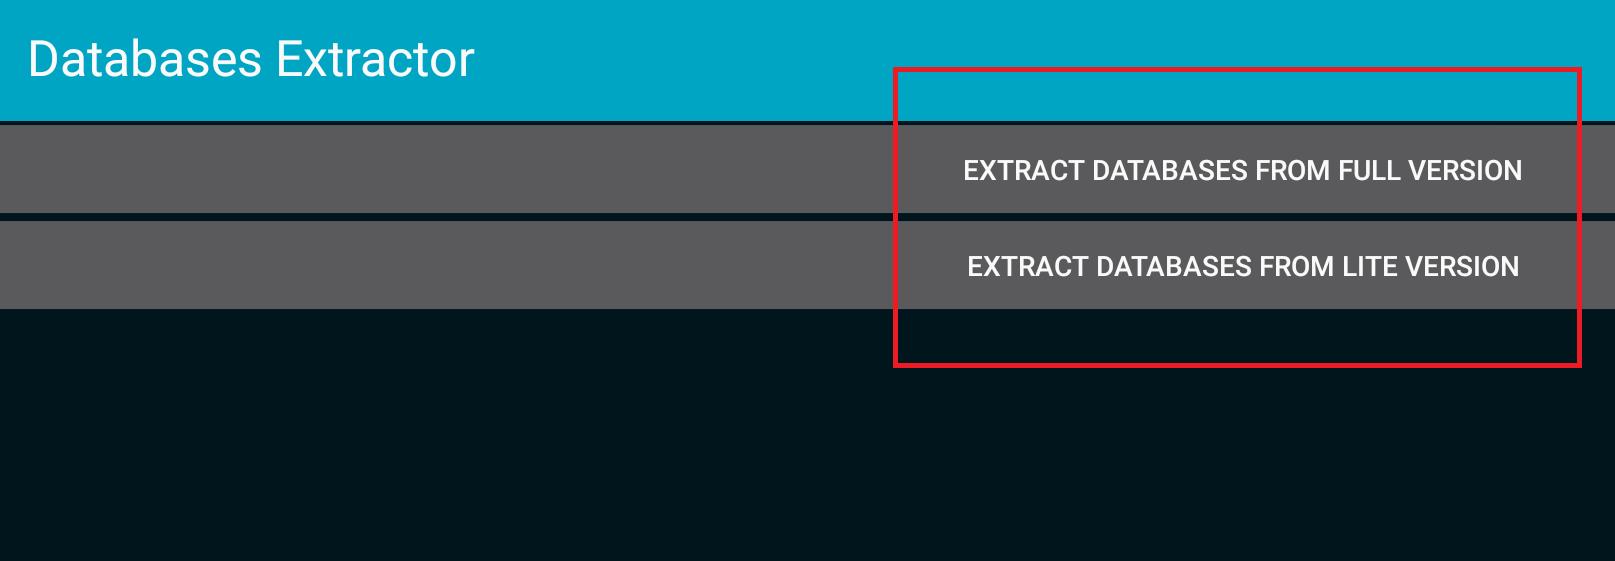 Database Extractor tool